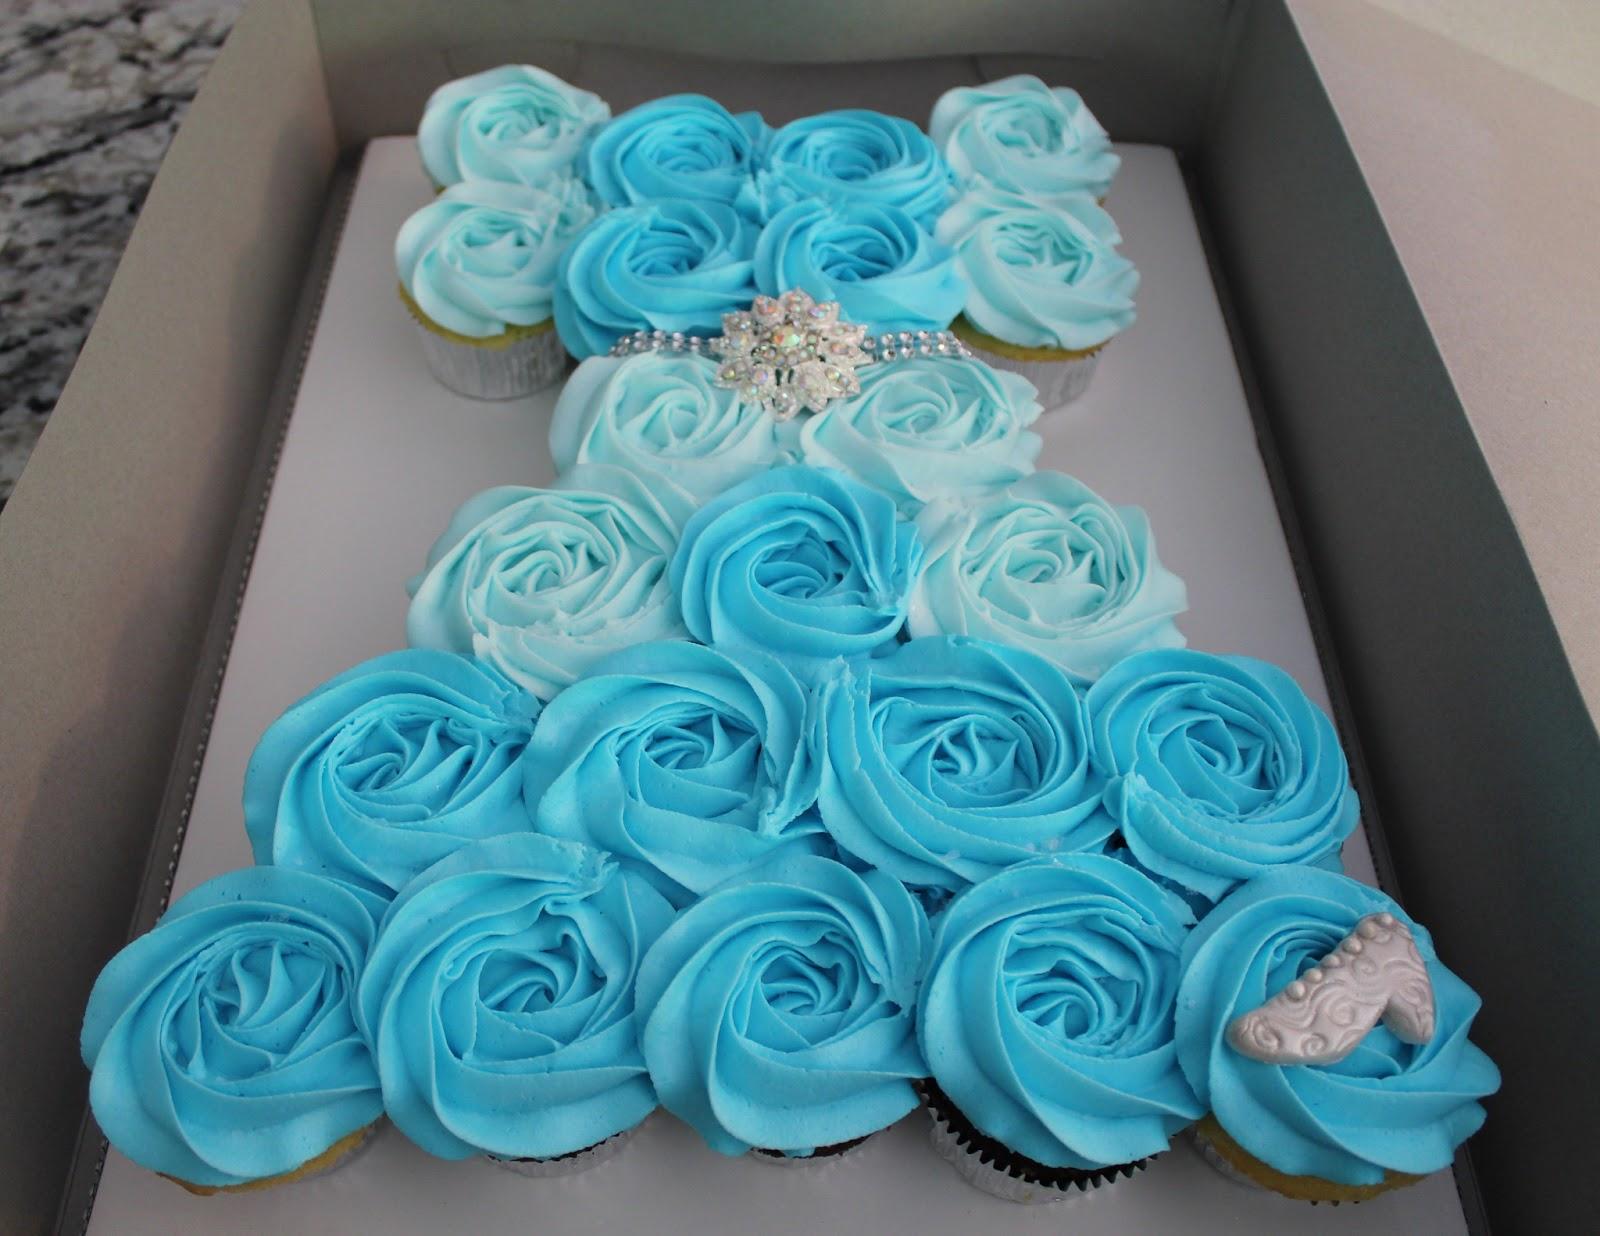 Cinderella Dress Cupcake Cake on Princess Elsa Birthday Cake